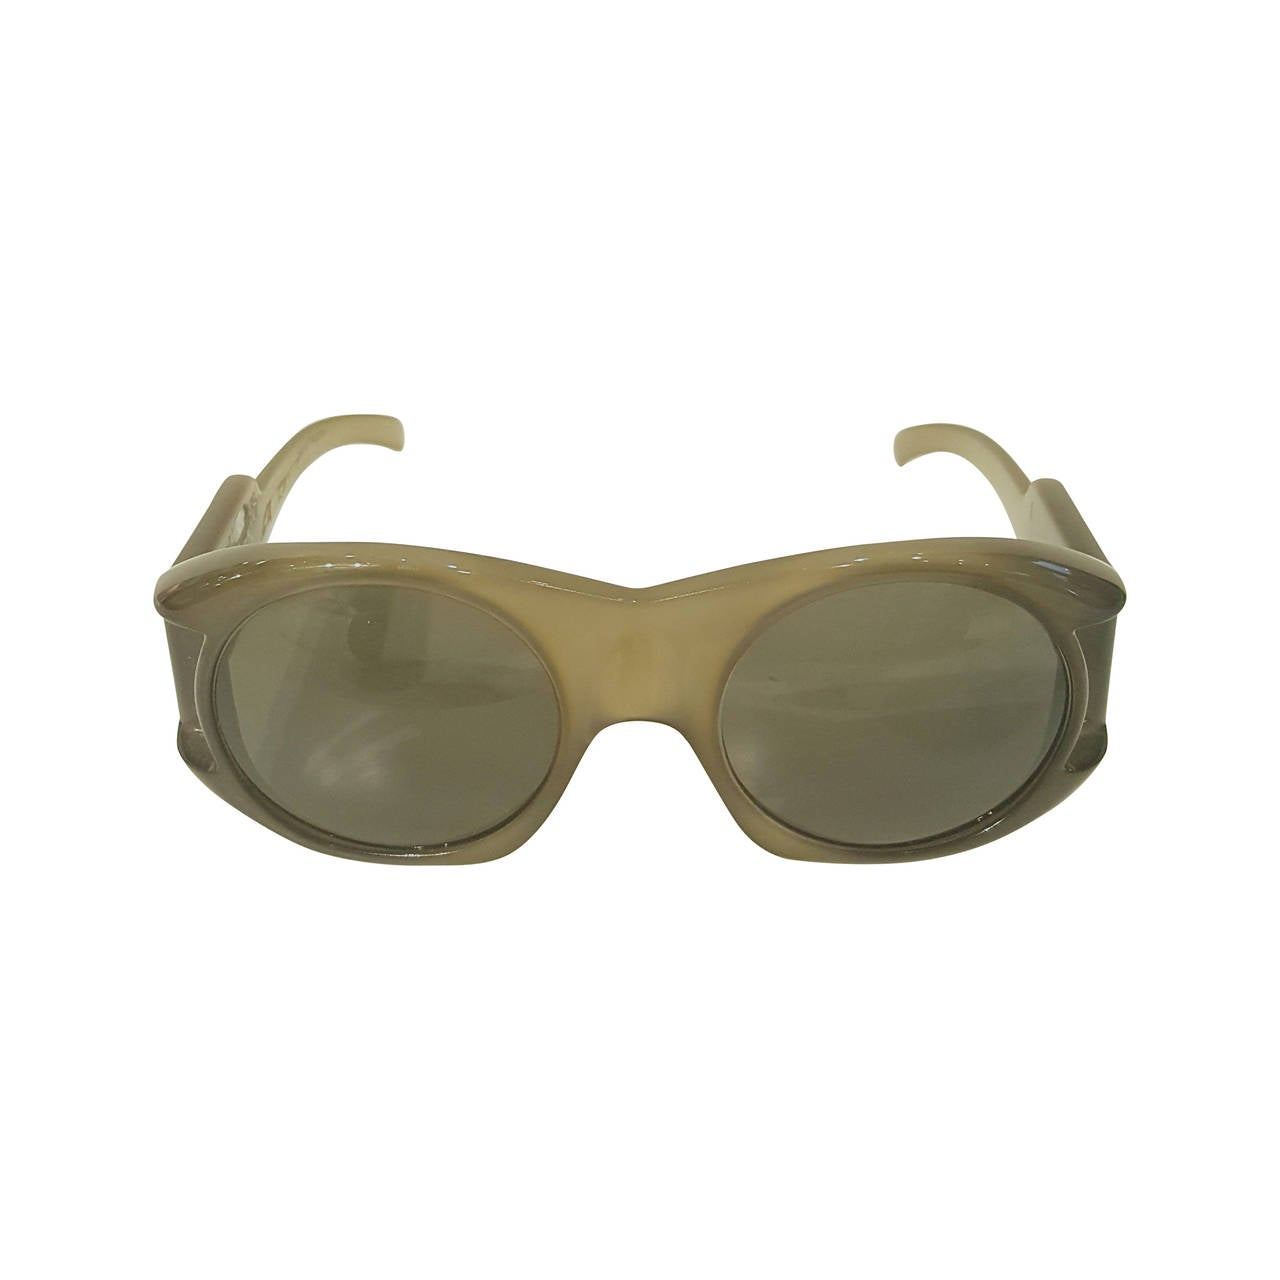 1970s Christian Dior sunglasses at 1stdibs